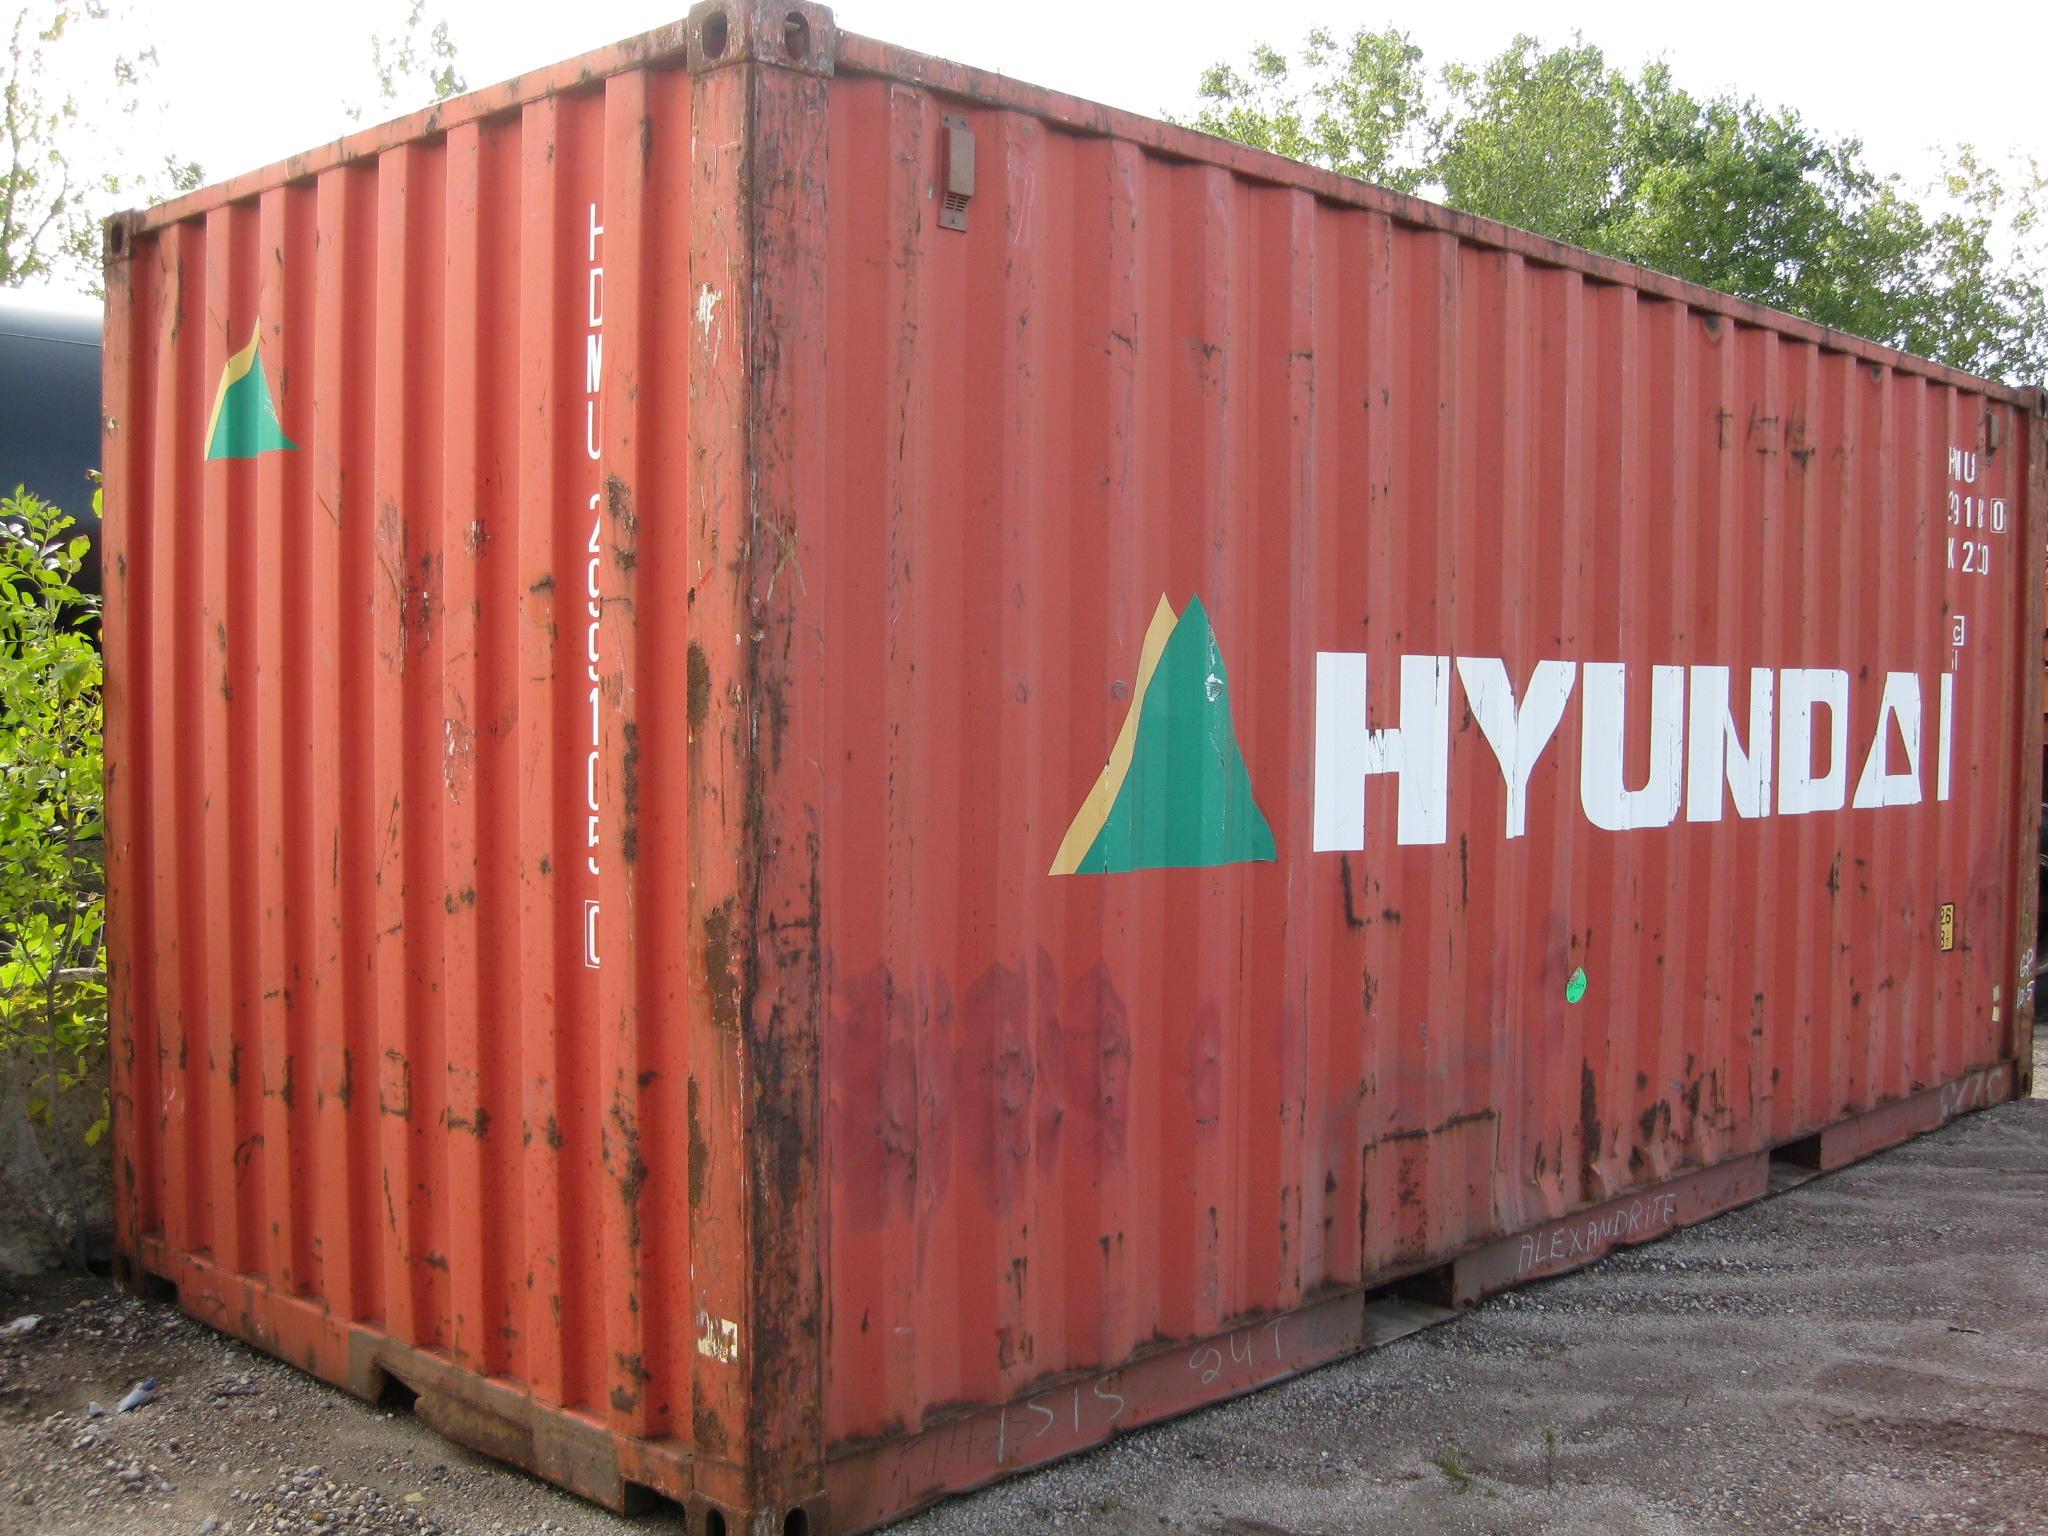 Used orange-red 20' container